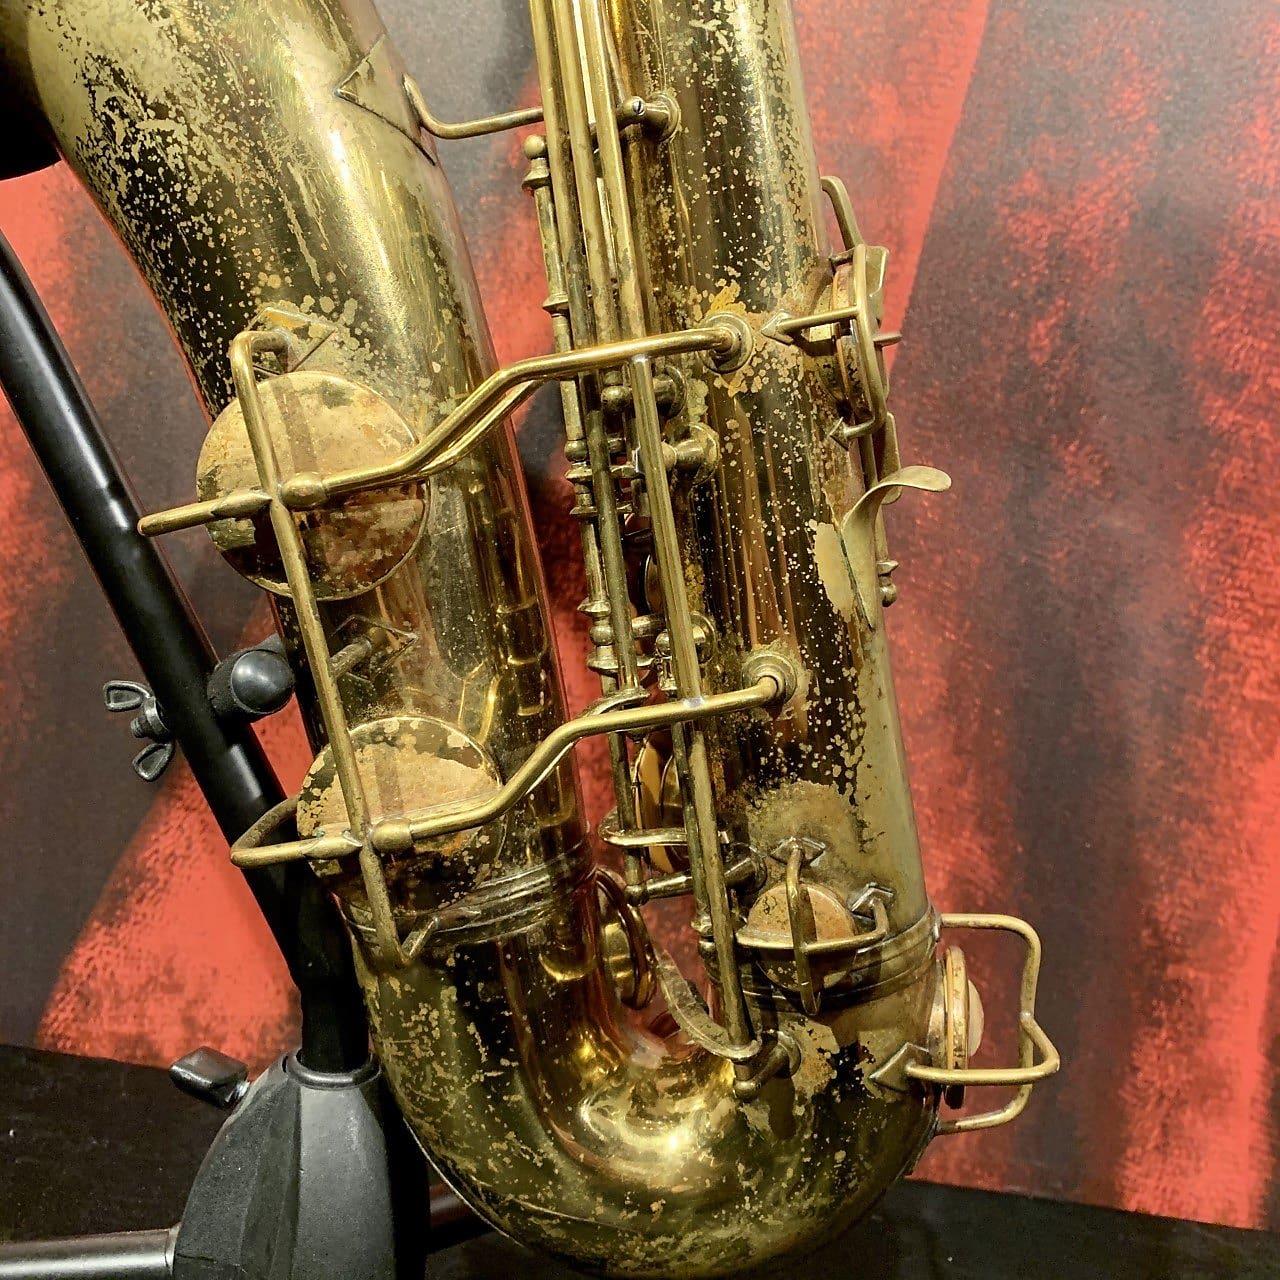 1952 Conn 10M Naked Lady Tenor Saxophone w/ Original Case